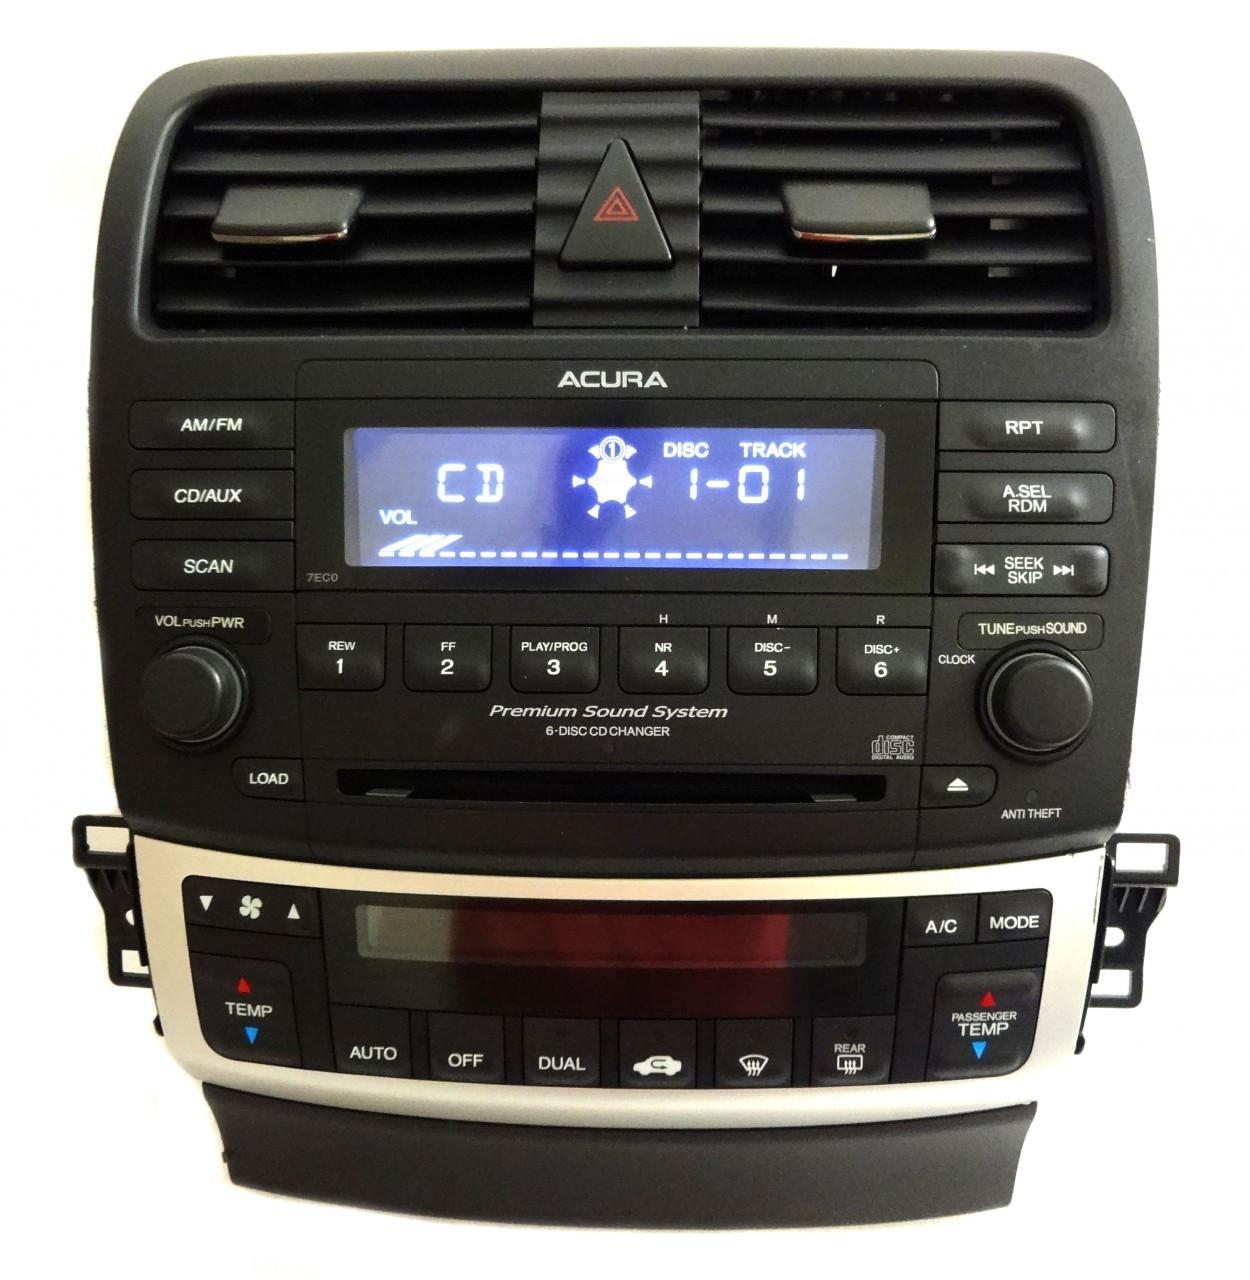 7EC0 2004 05 06 07 08 Acura TSX Radio 6 CD Changer Stereo